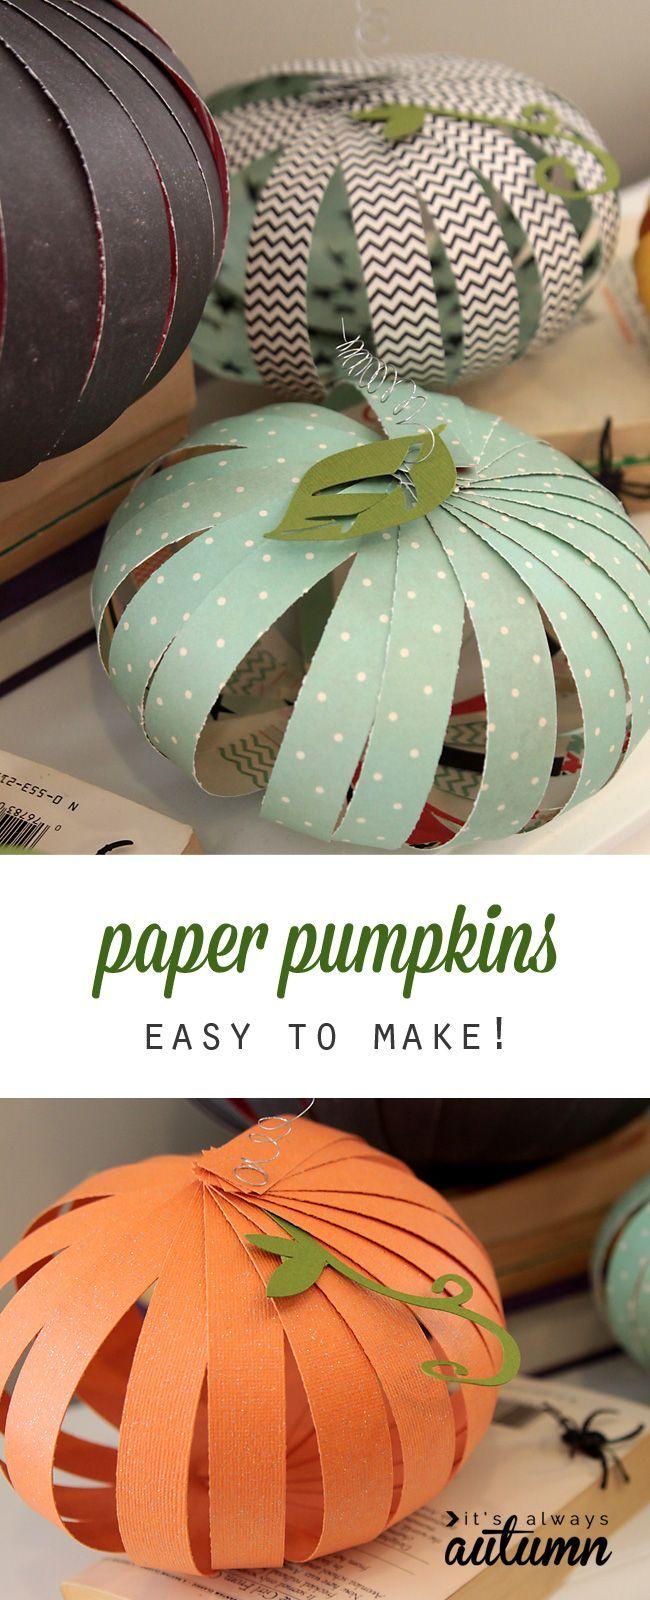 How to make paper pumpkins {fun + easy Halloween kids